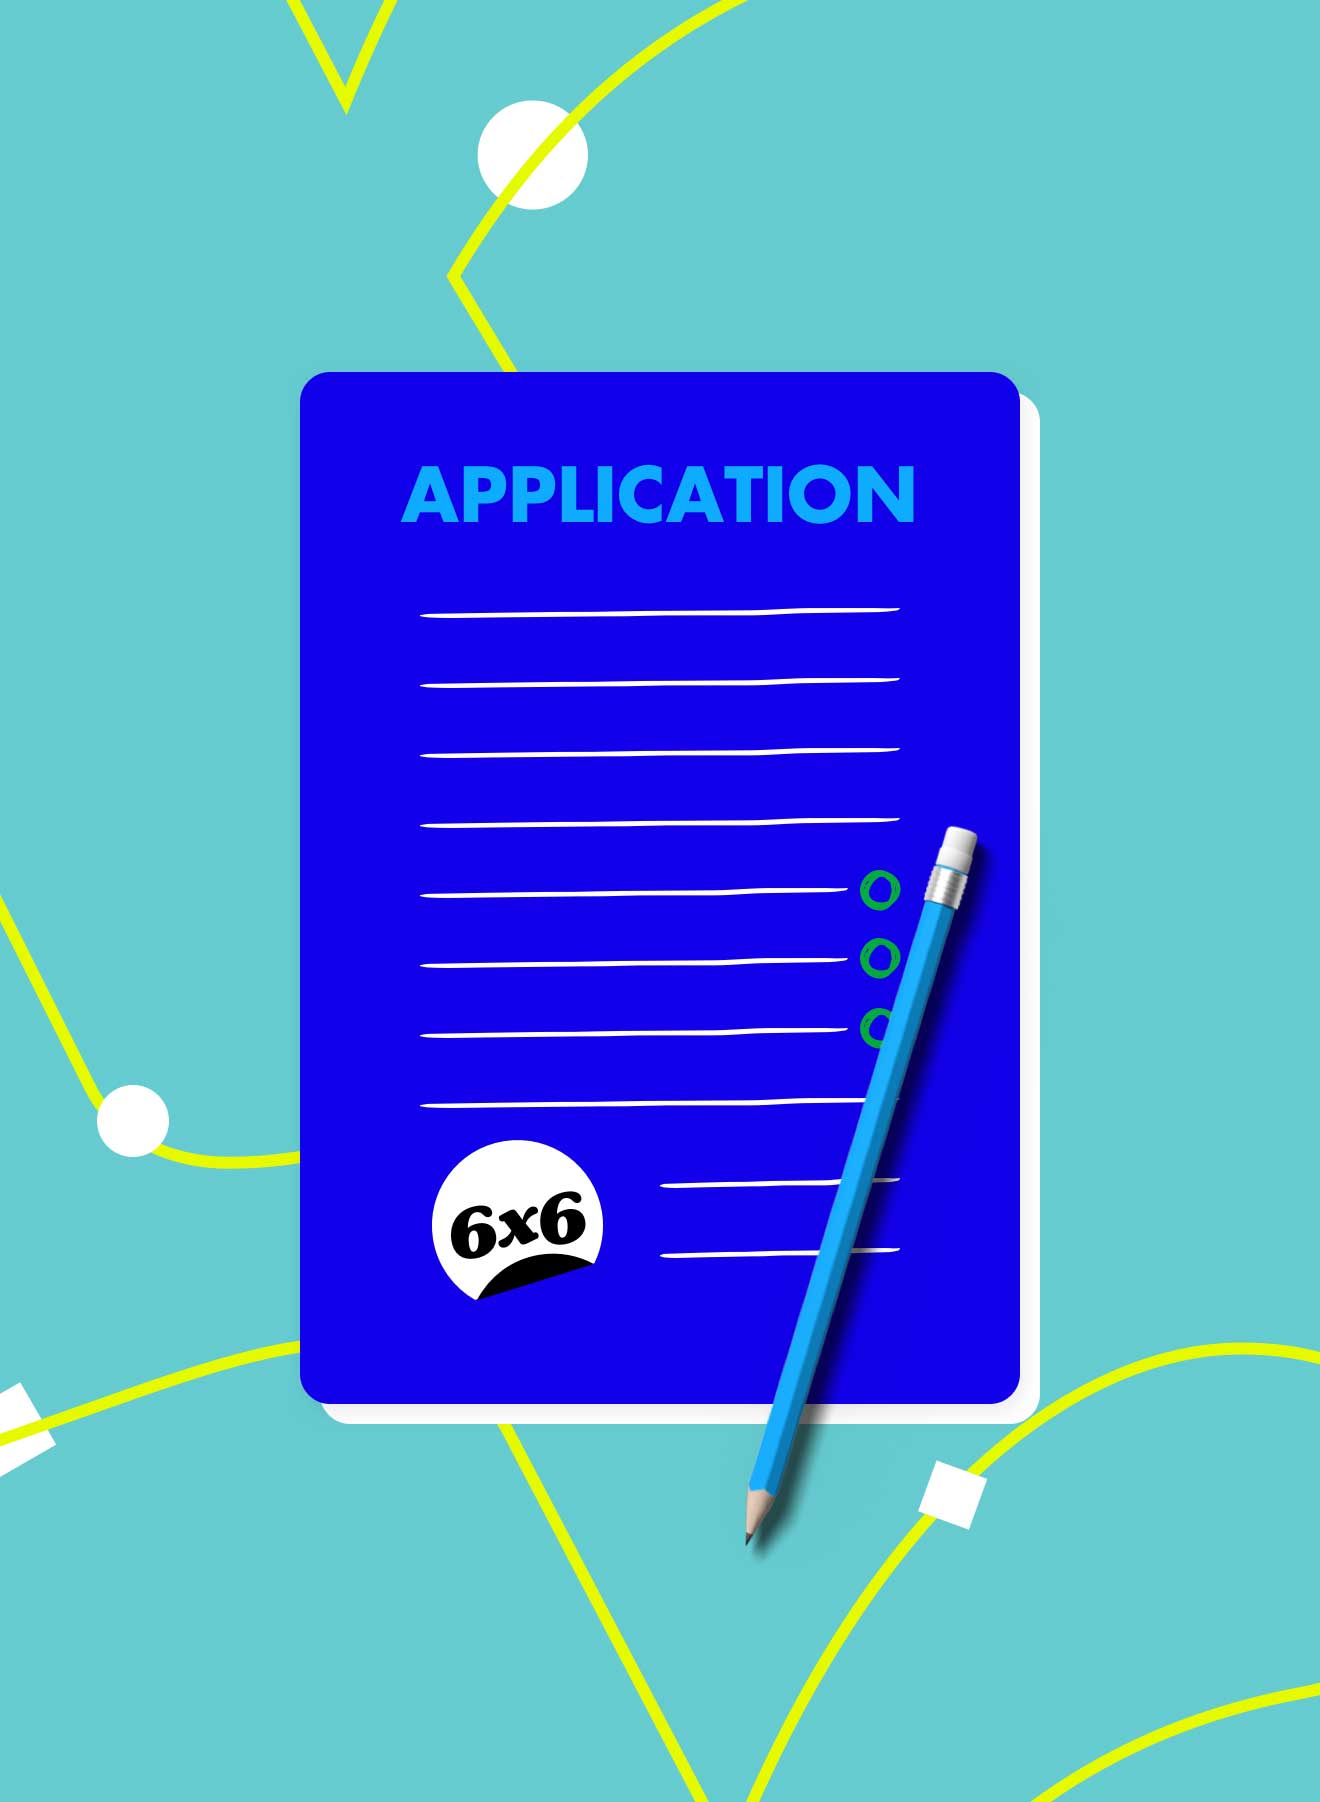 6x6 application information